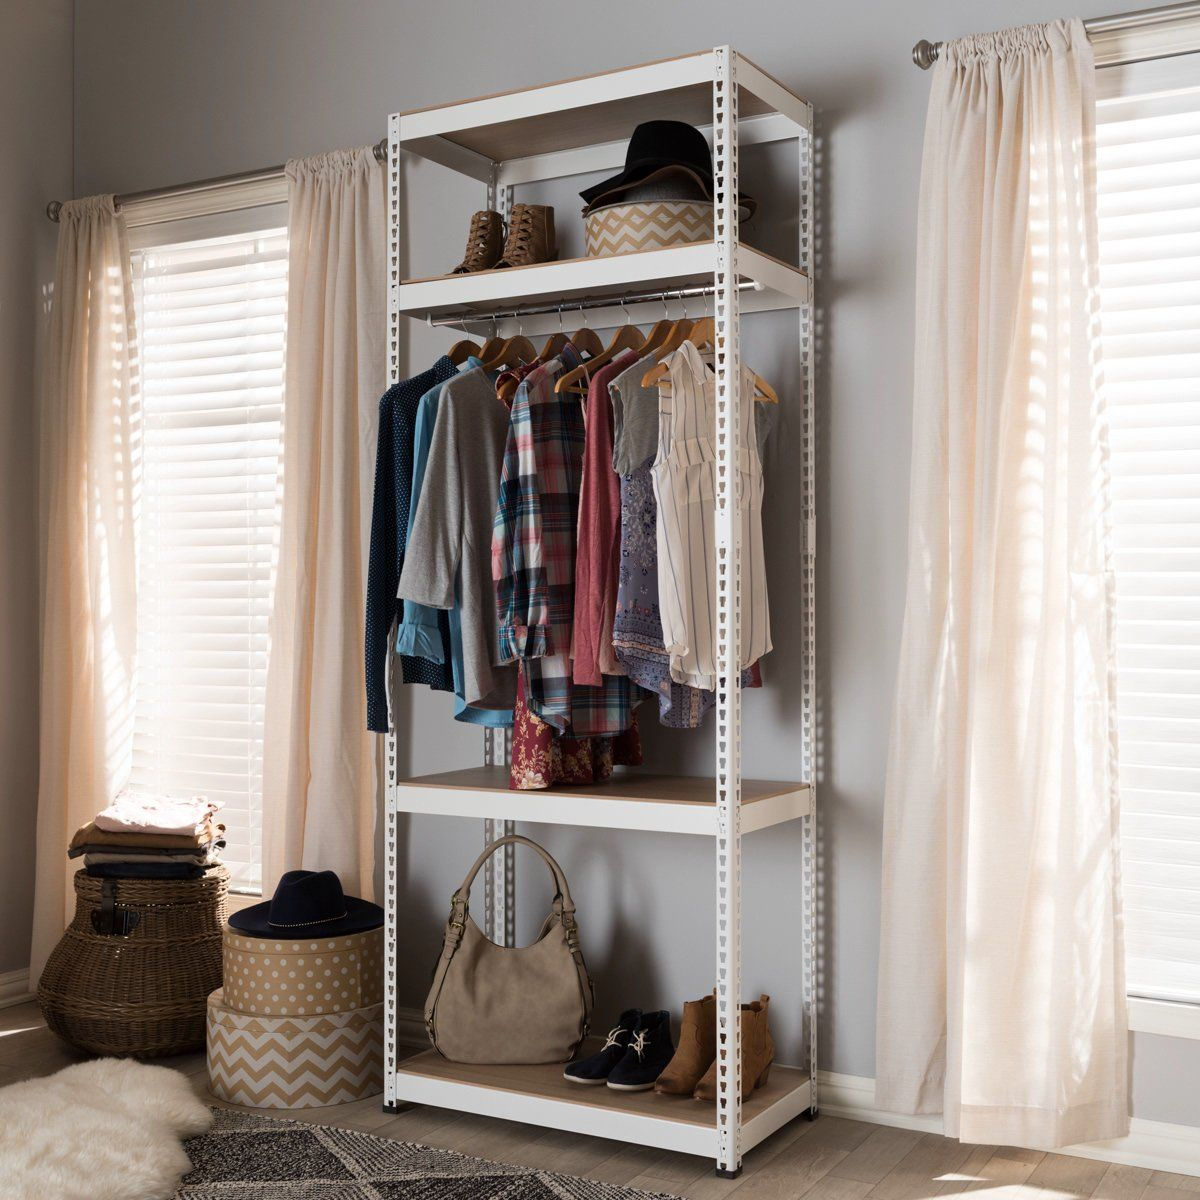 Baxton studio gavin white metal shelf closet storage racking